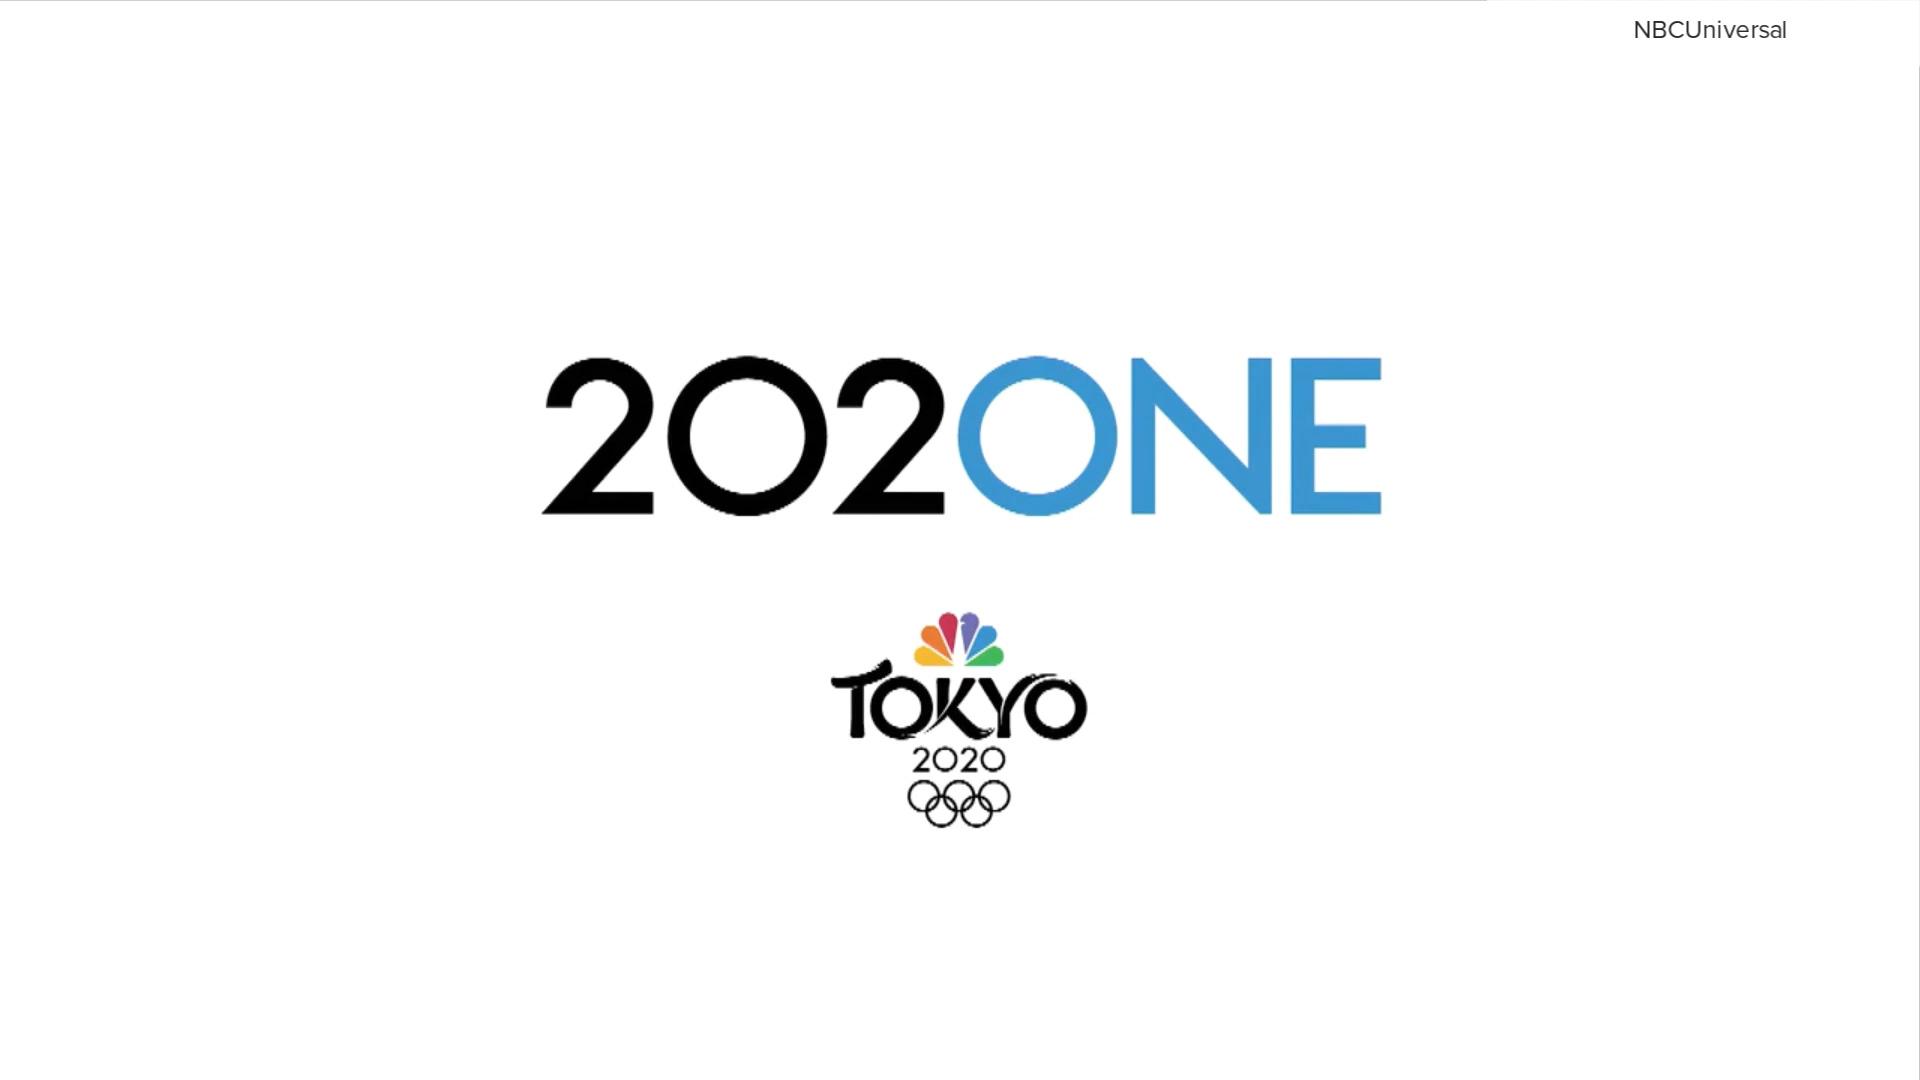 202One NBC Olympics